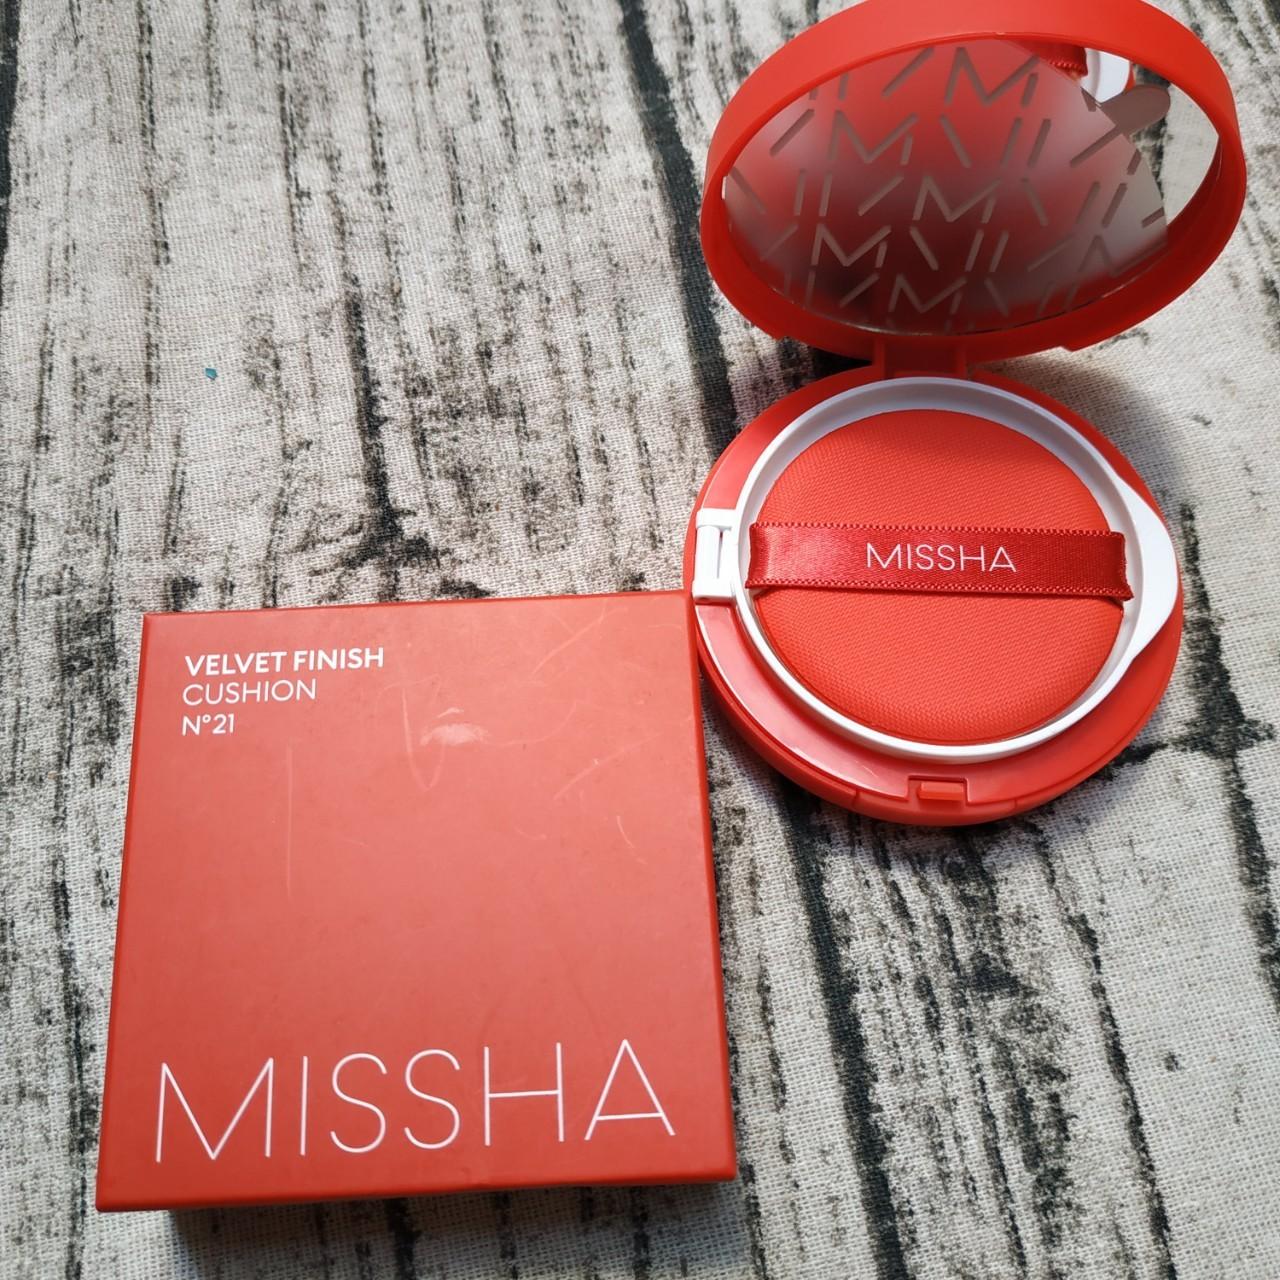 Phấn nước Missha Velvet Finish Cushion (Vỏ Đỏ)